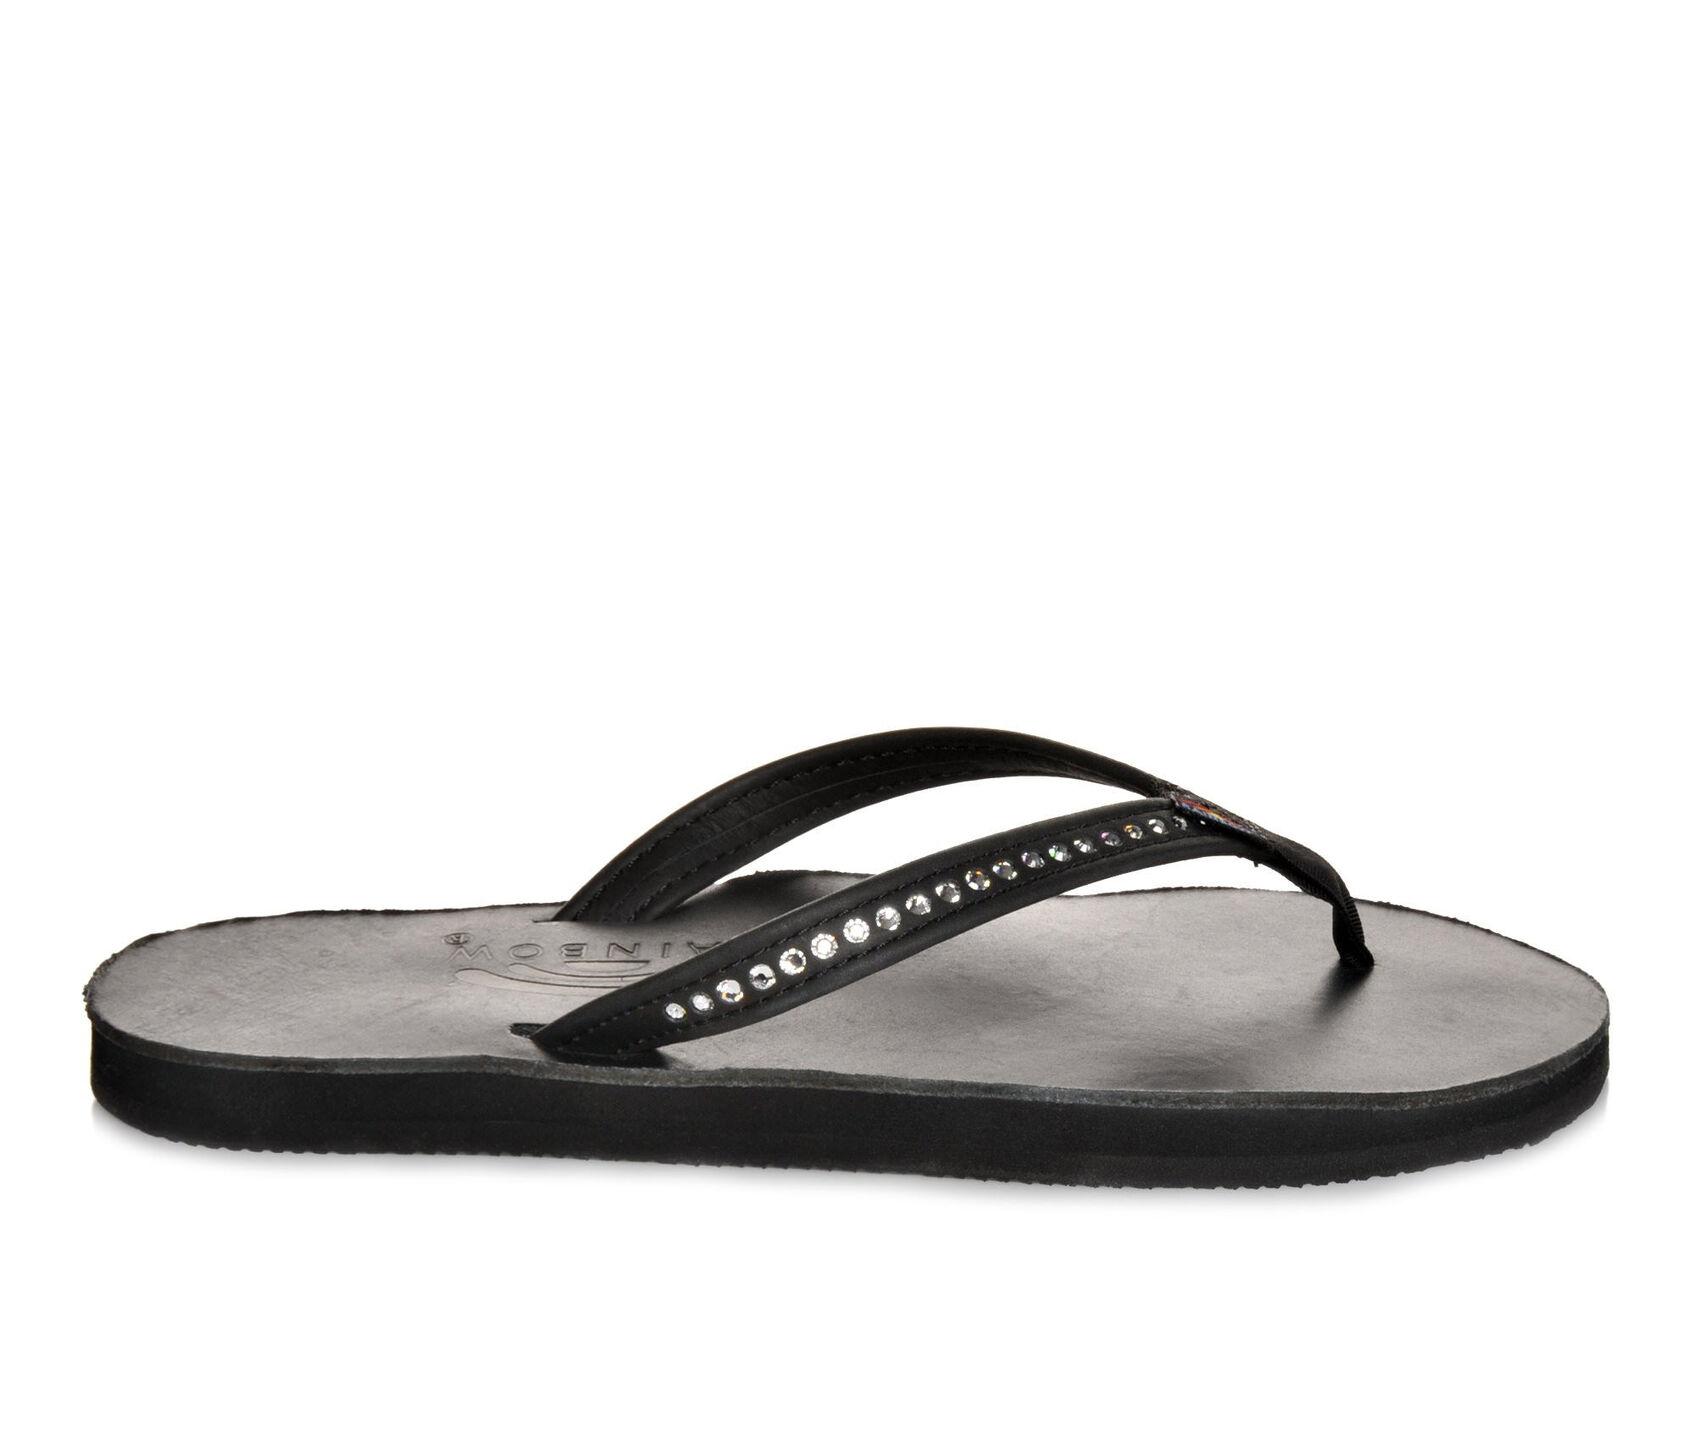 40941cb01a3 Women s Rainbow Sandals Leather w  Swarovski Crystals -401ALTSN Flip ...